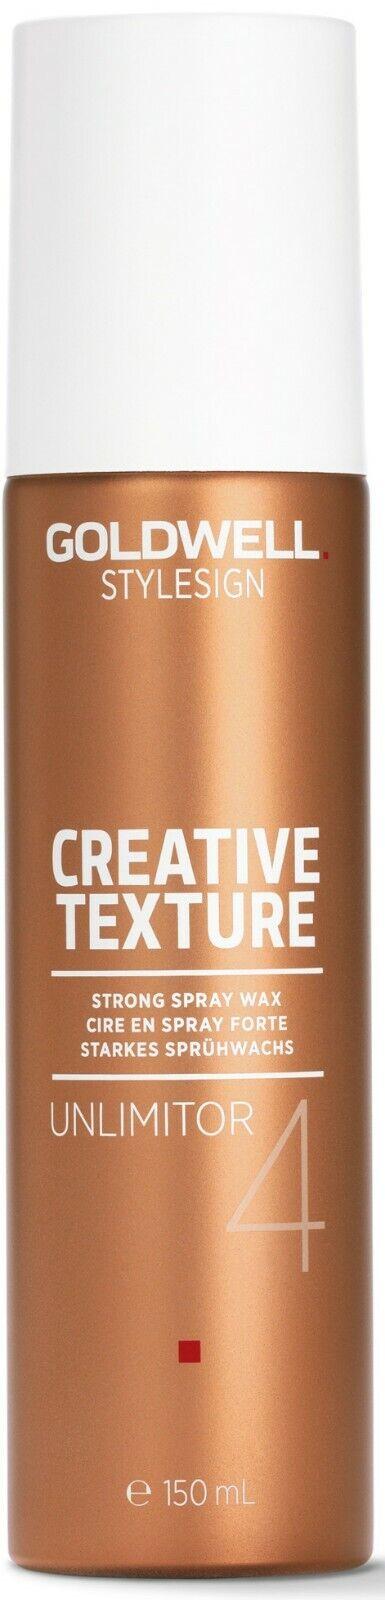 Goldwell Style Sign Creative Texture Unlimitor Sprüh Haarwachs 150 ml